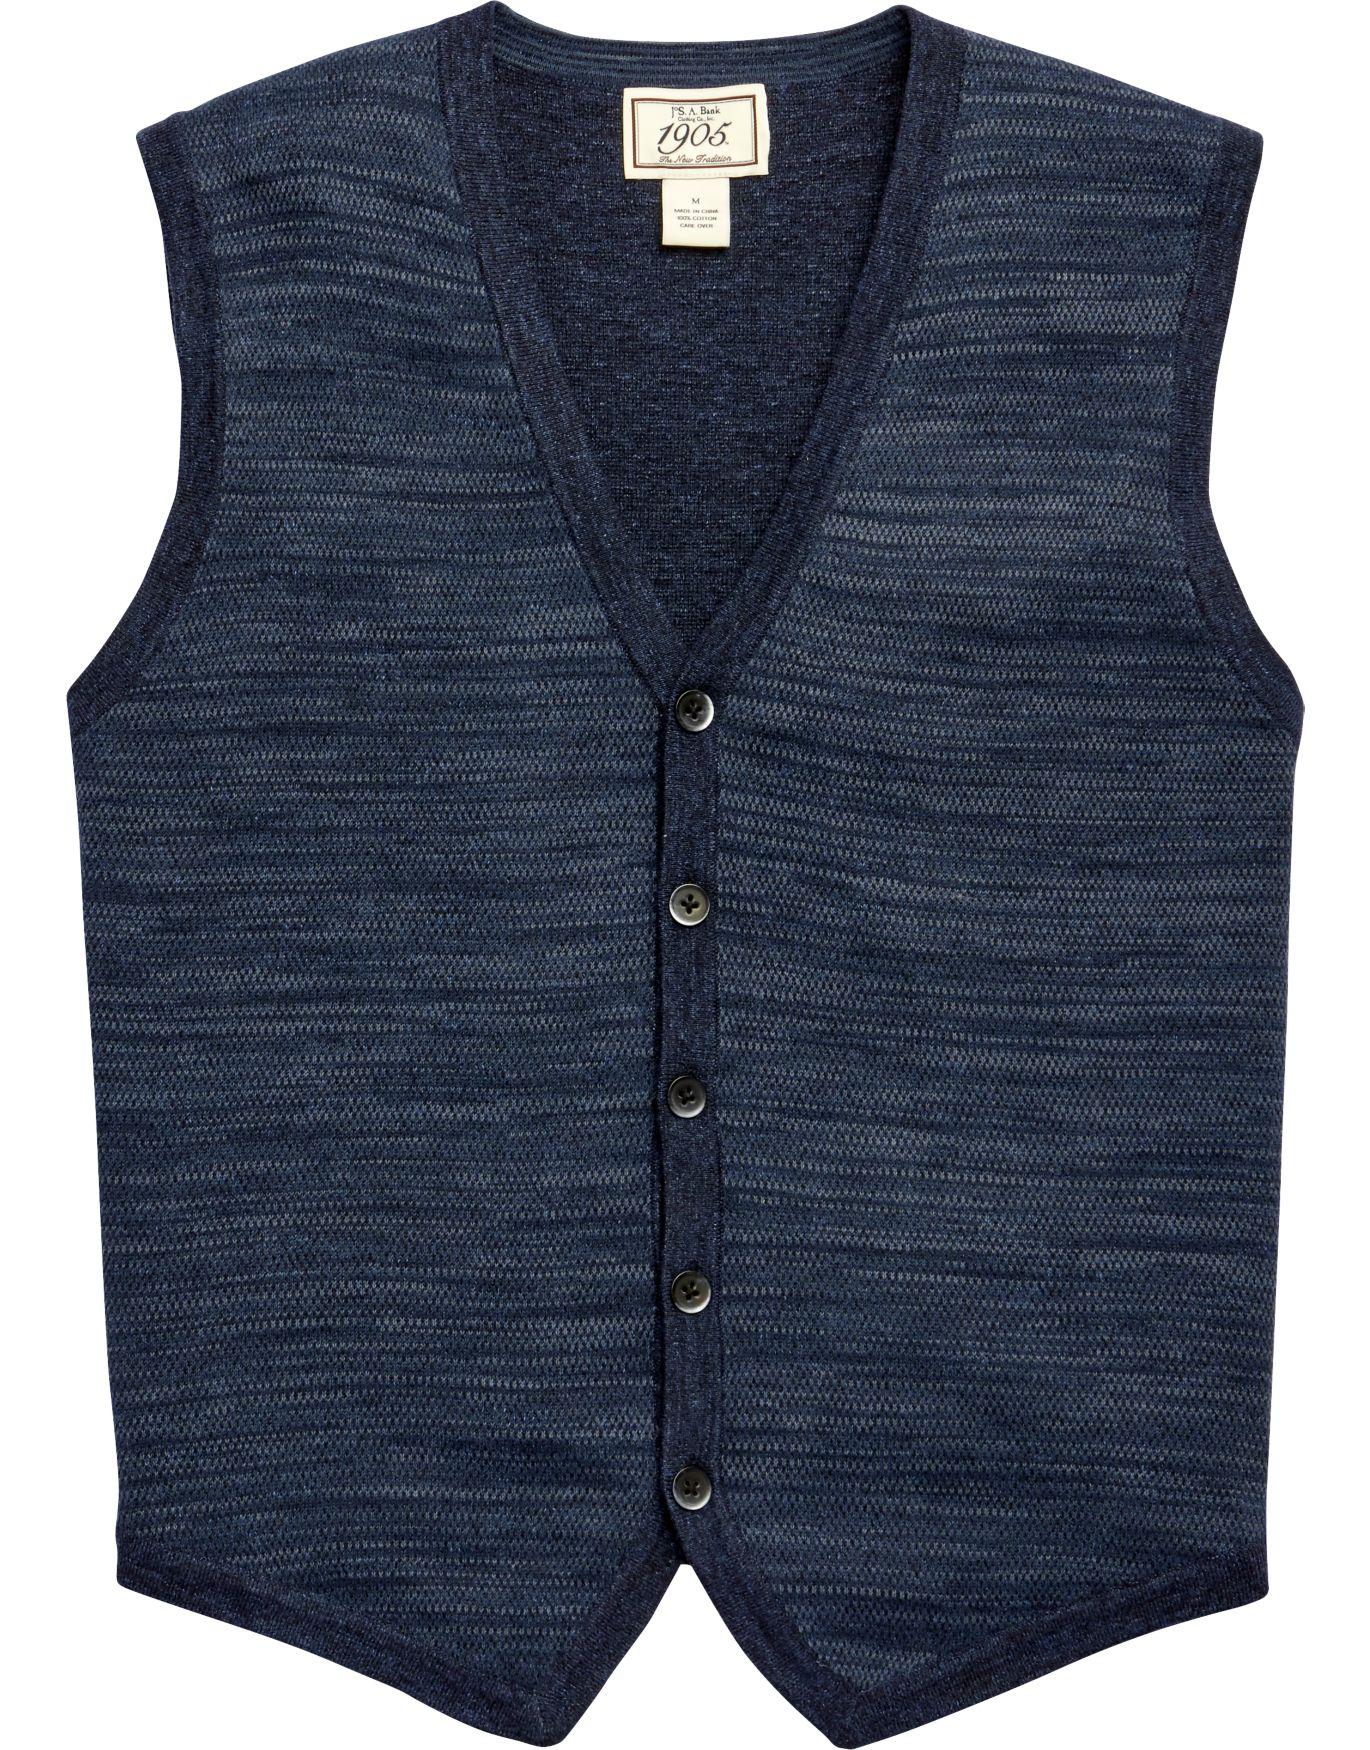 1905 Indigo Cardigan Vest CLEARANCE - All Clearance | Jos A Bank